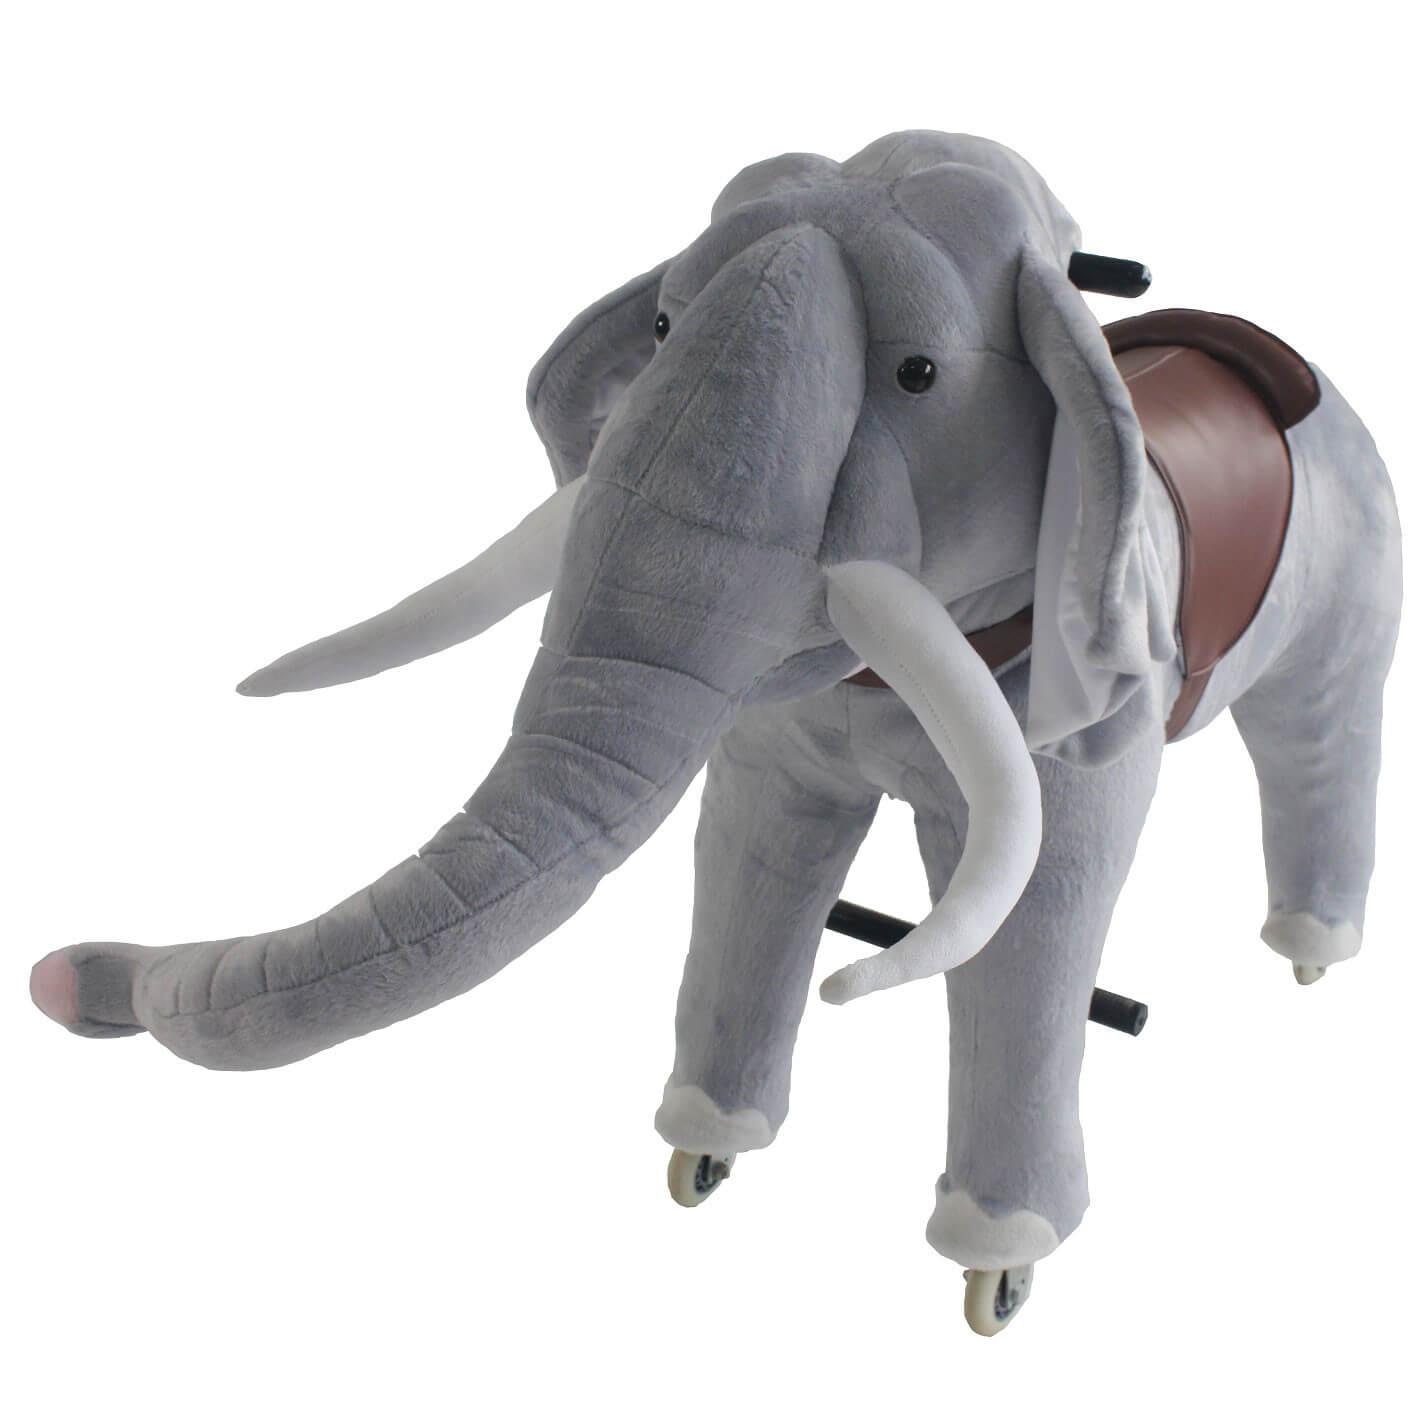 Läs mer om Elefanten Dumbo. Höjd 85 cm.